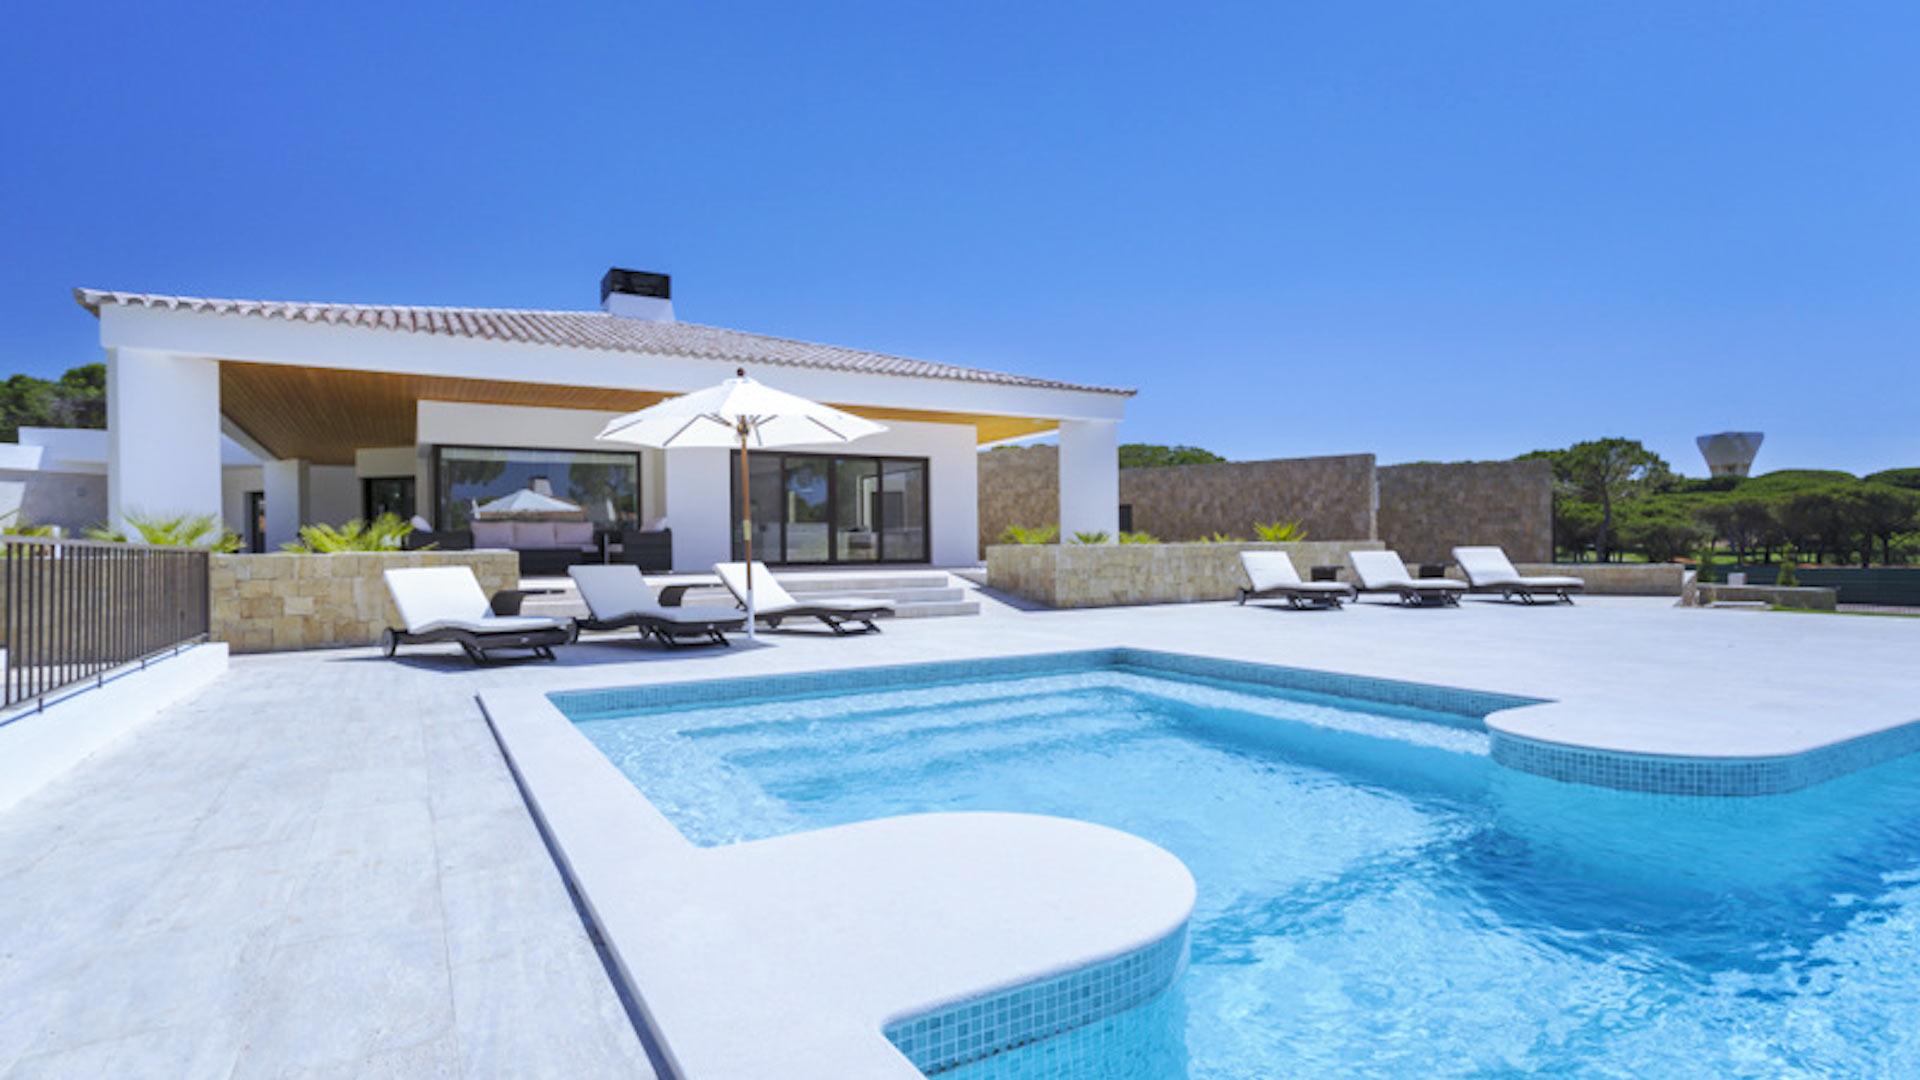 Location Villa De Luxe Vilamoura Algarve Portugal: Le Top tout Location Maison Portugal Piscine